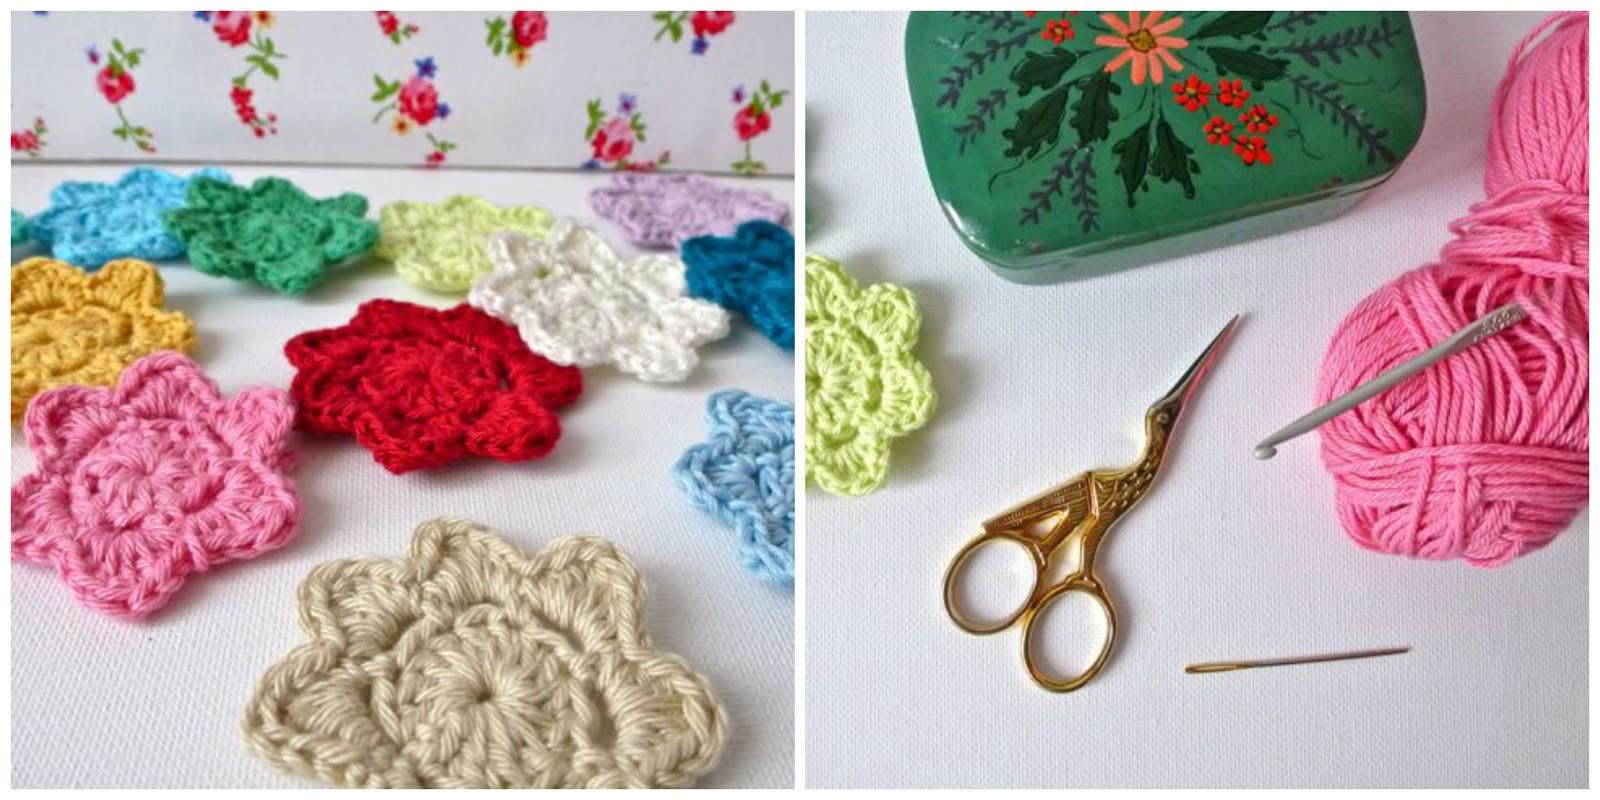 My rose valley darling crochet flower pattern darling crochet flower pattern bankloansurffo Images